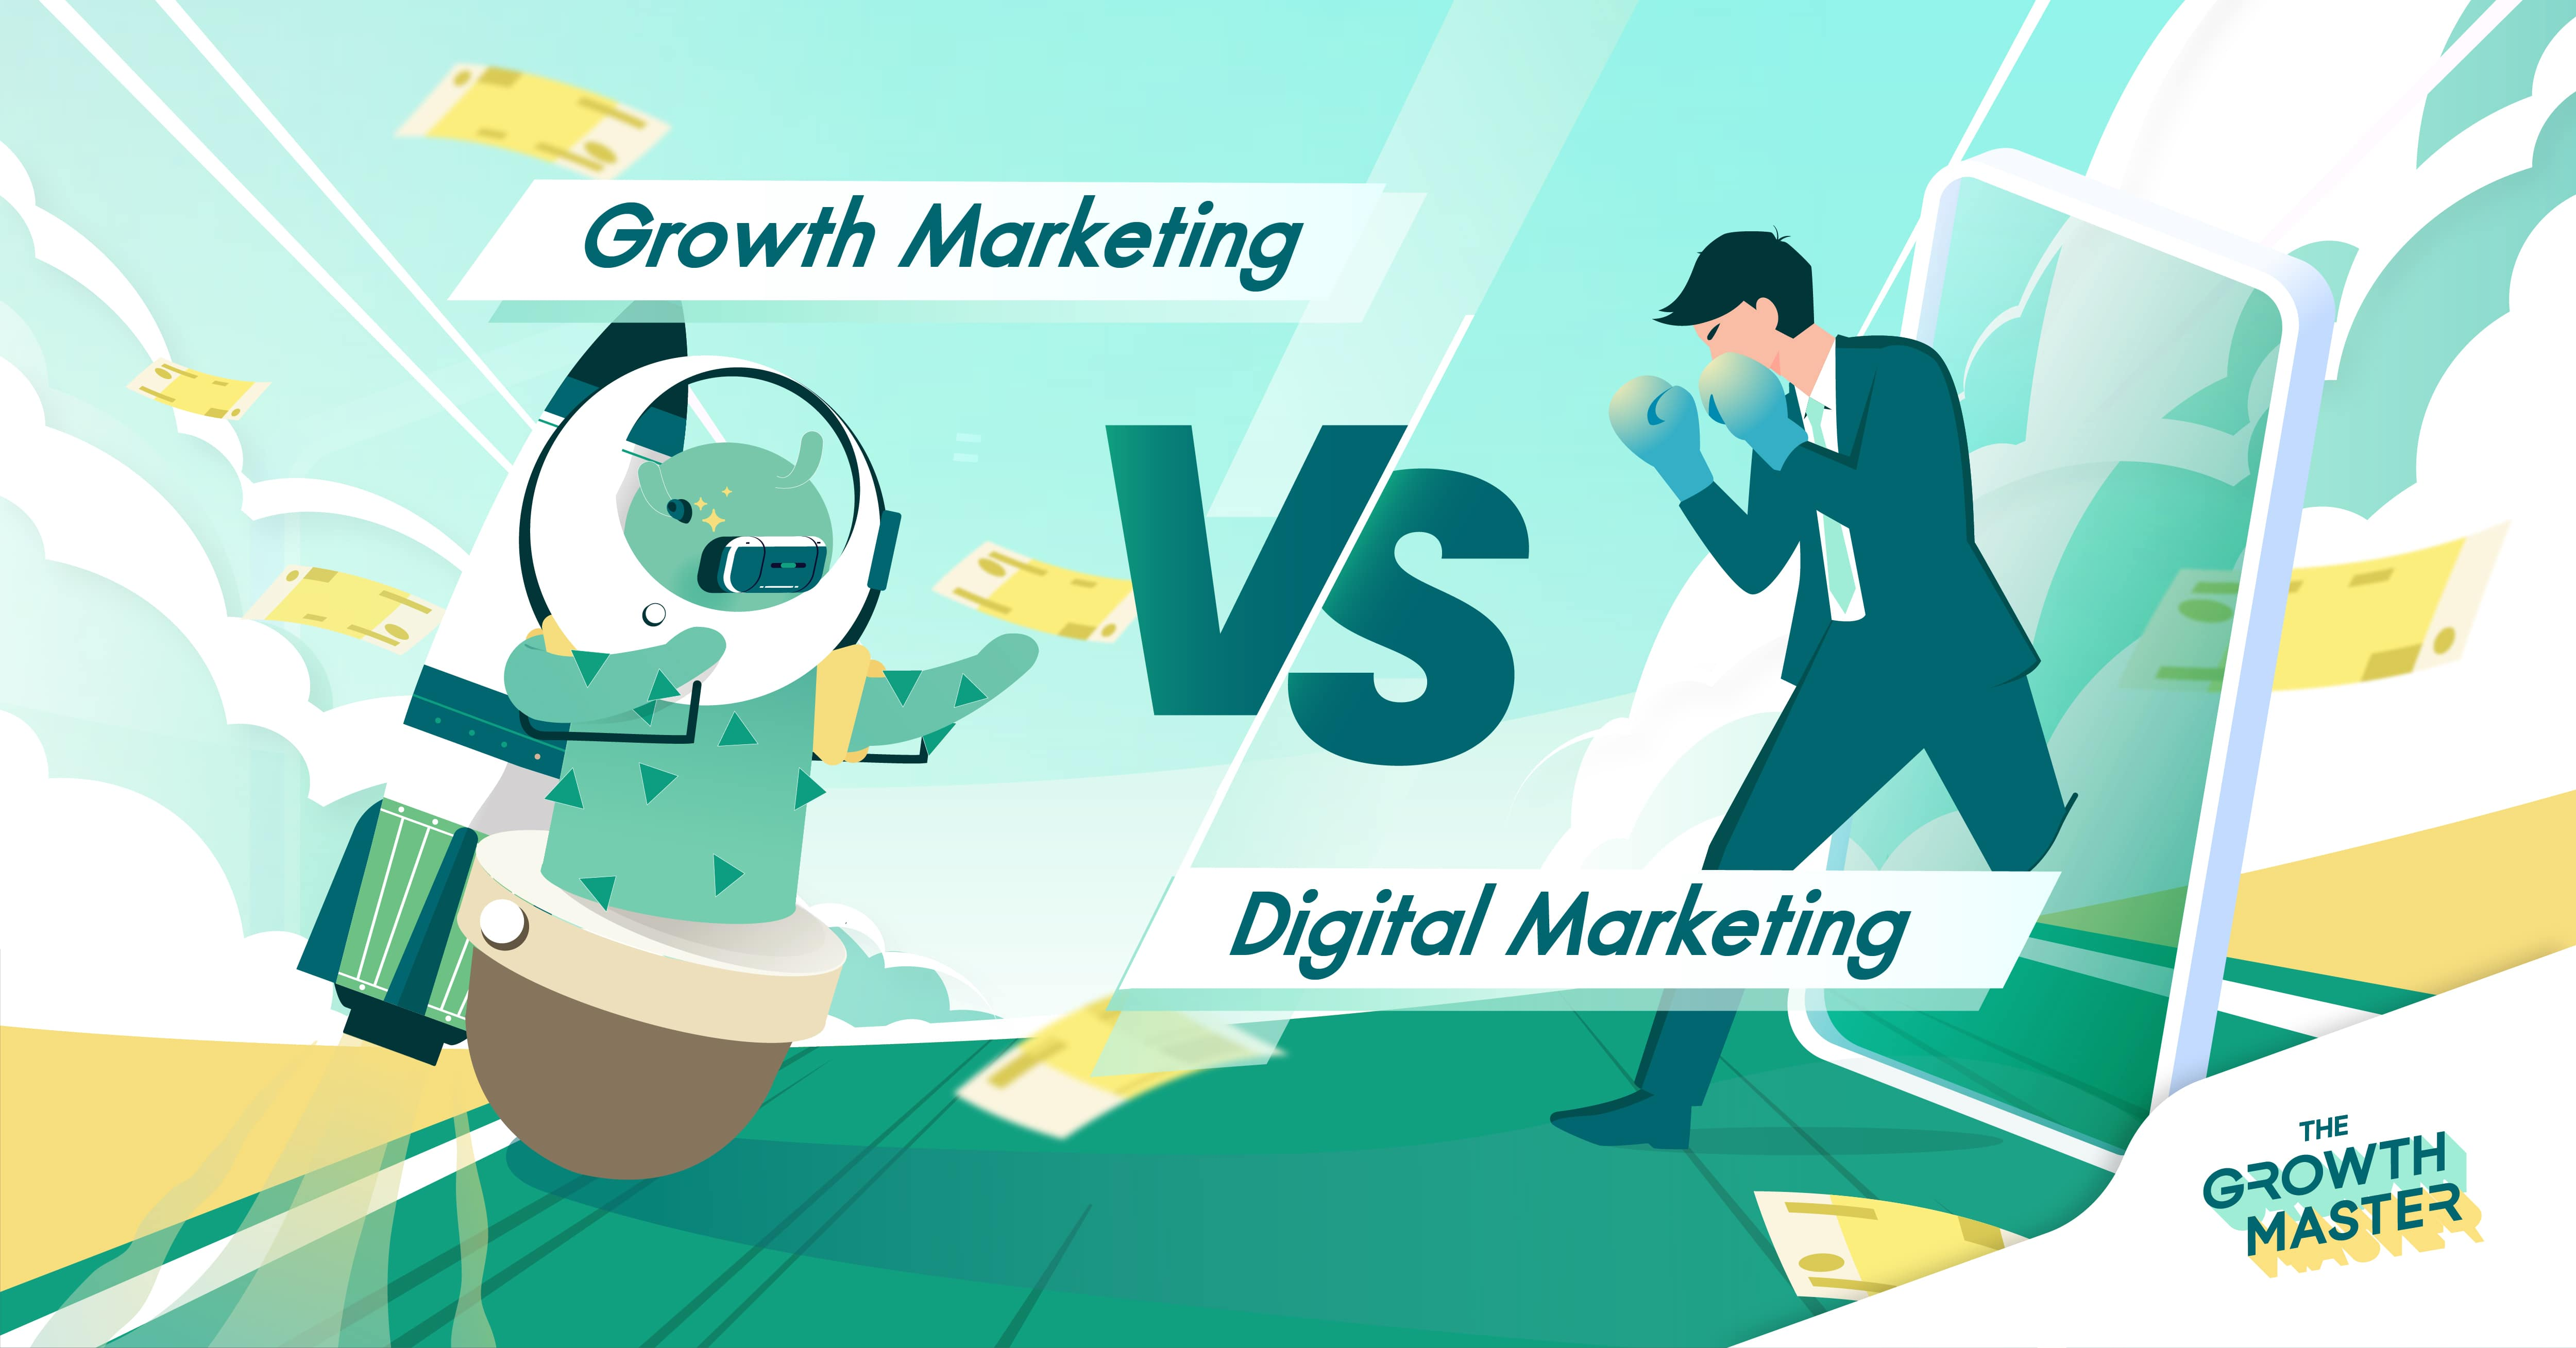 Growth Marketing VS Digital Marketing กลยุทธ์ไหนที่สร้างการเติบโตให้กับธุรกิจของคุณได้มากกว่า